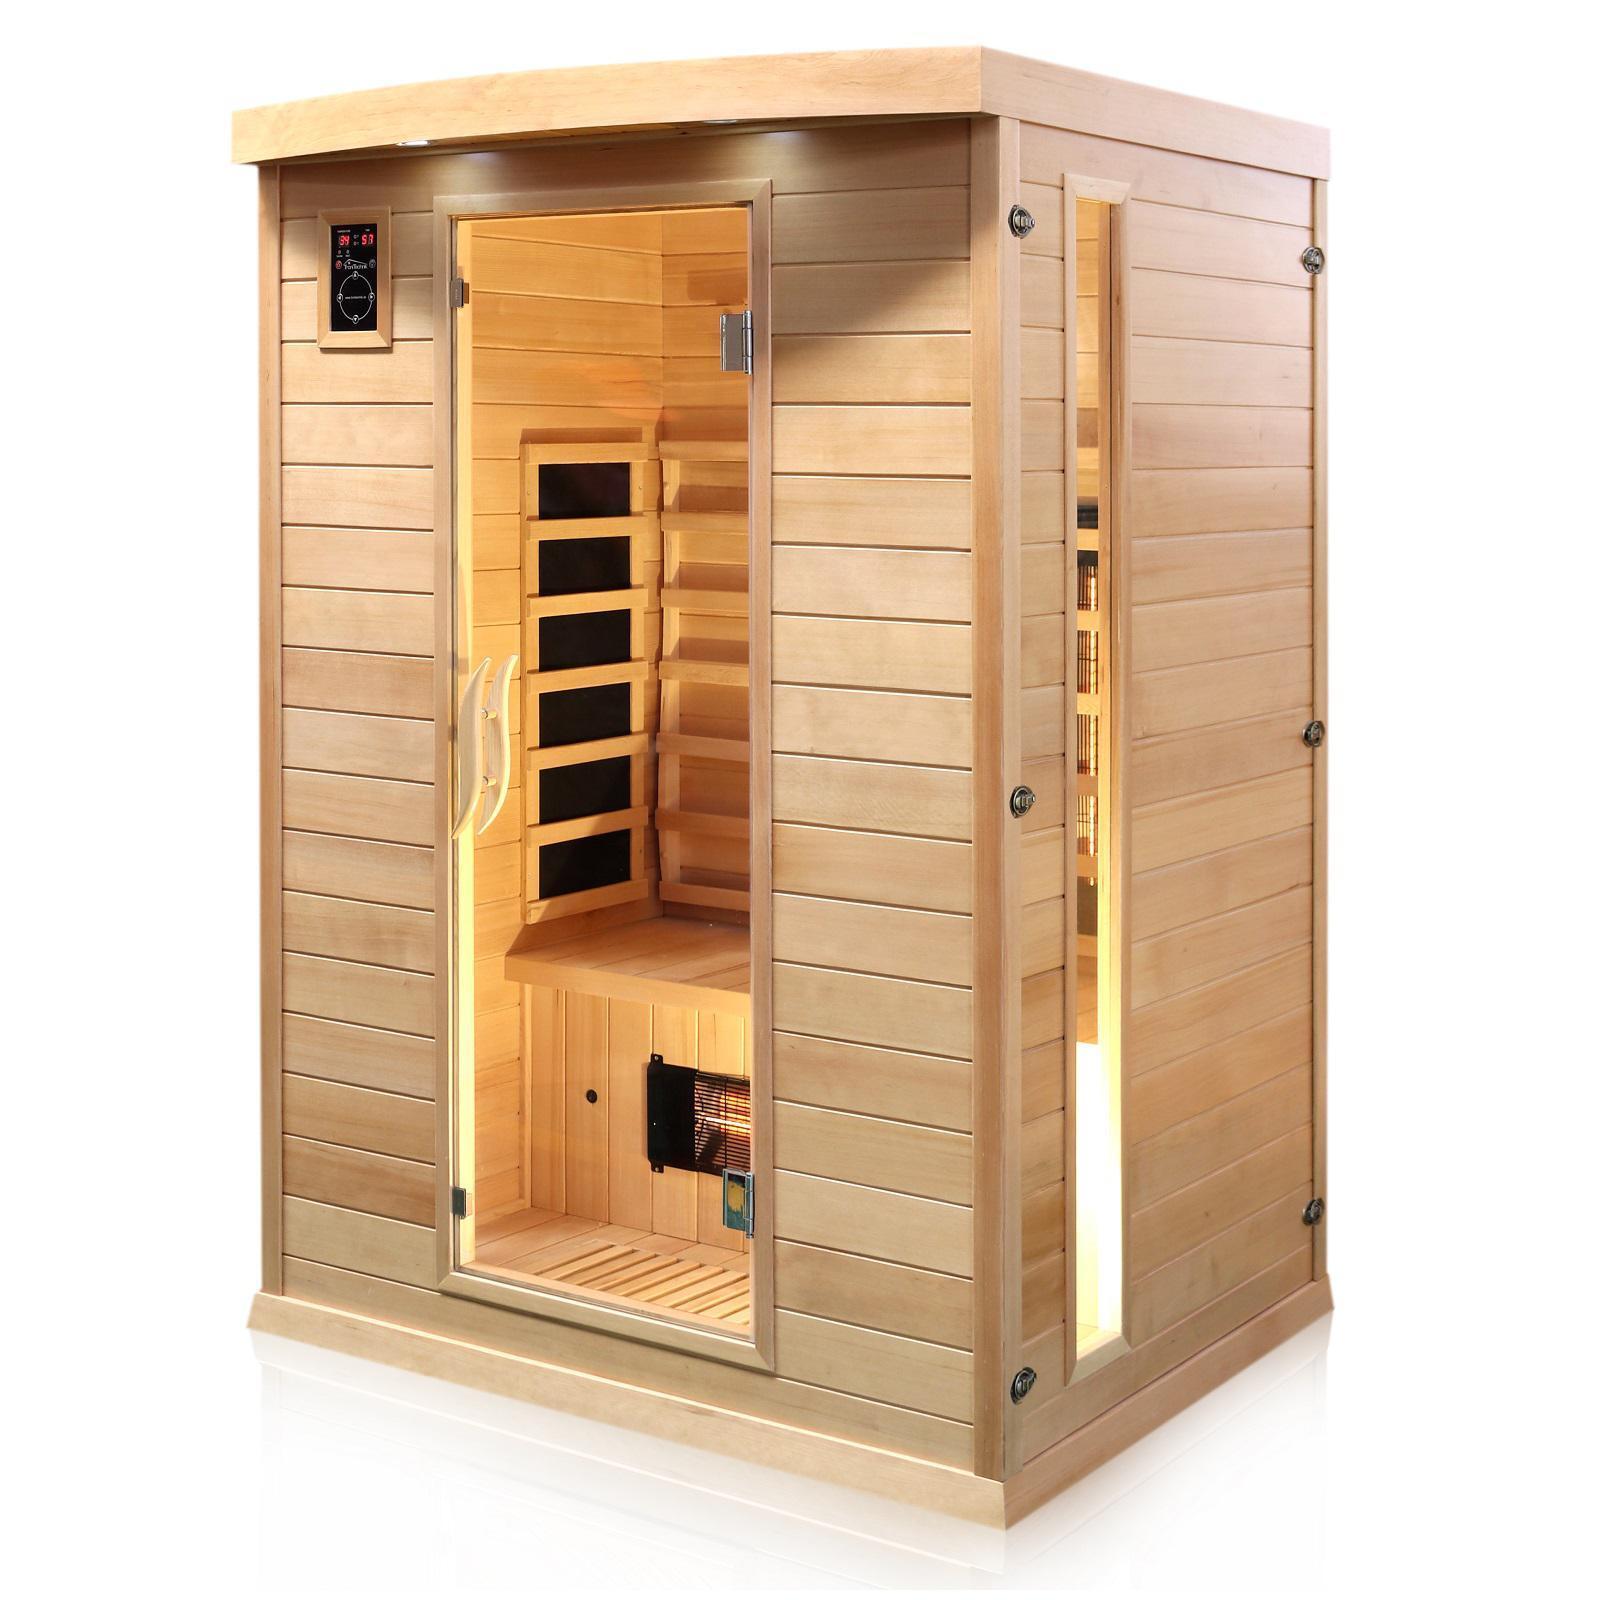 Infrarotkabine Infrarotsauna Wärmekabine Sauna Saunakabine 2 Person Vollspektrum